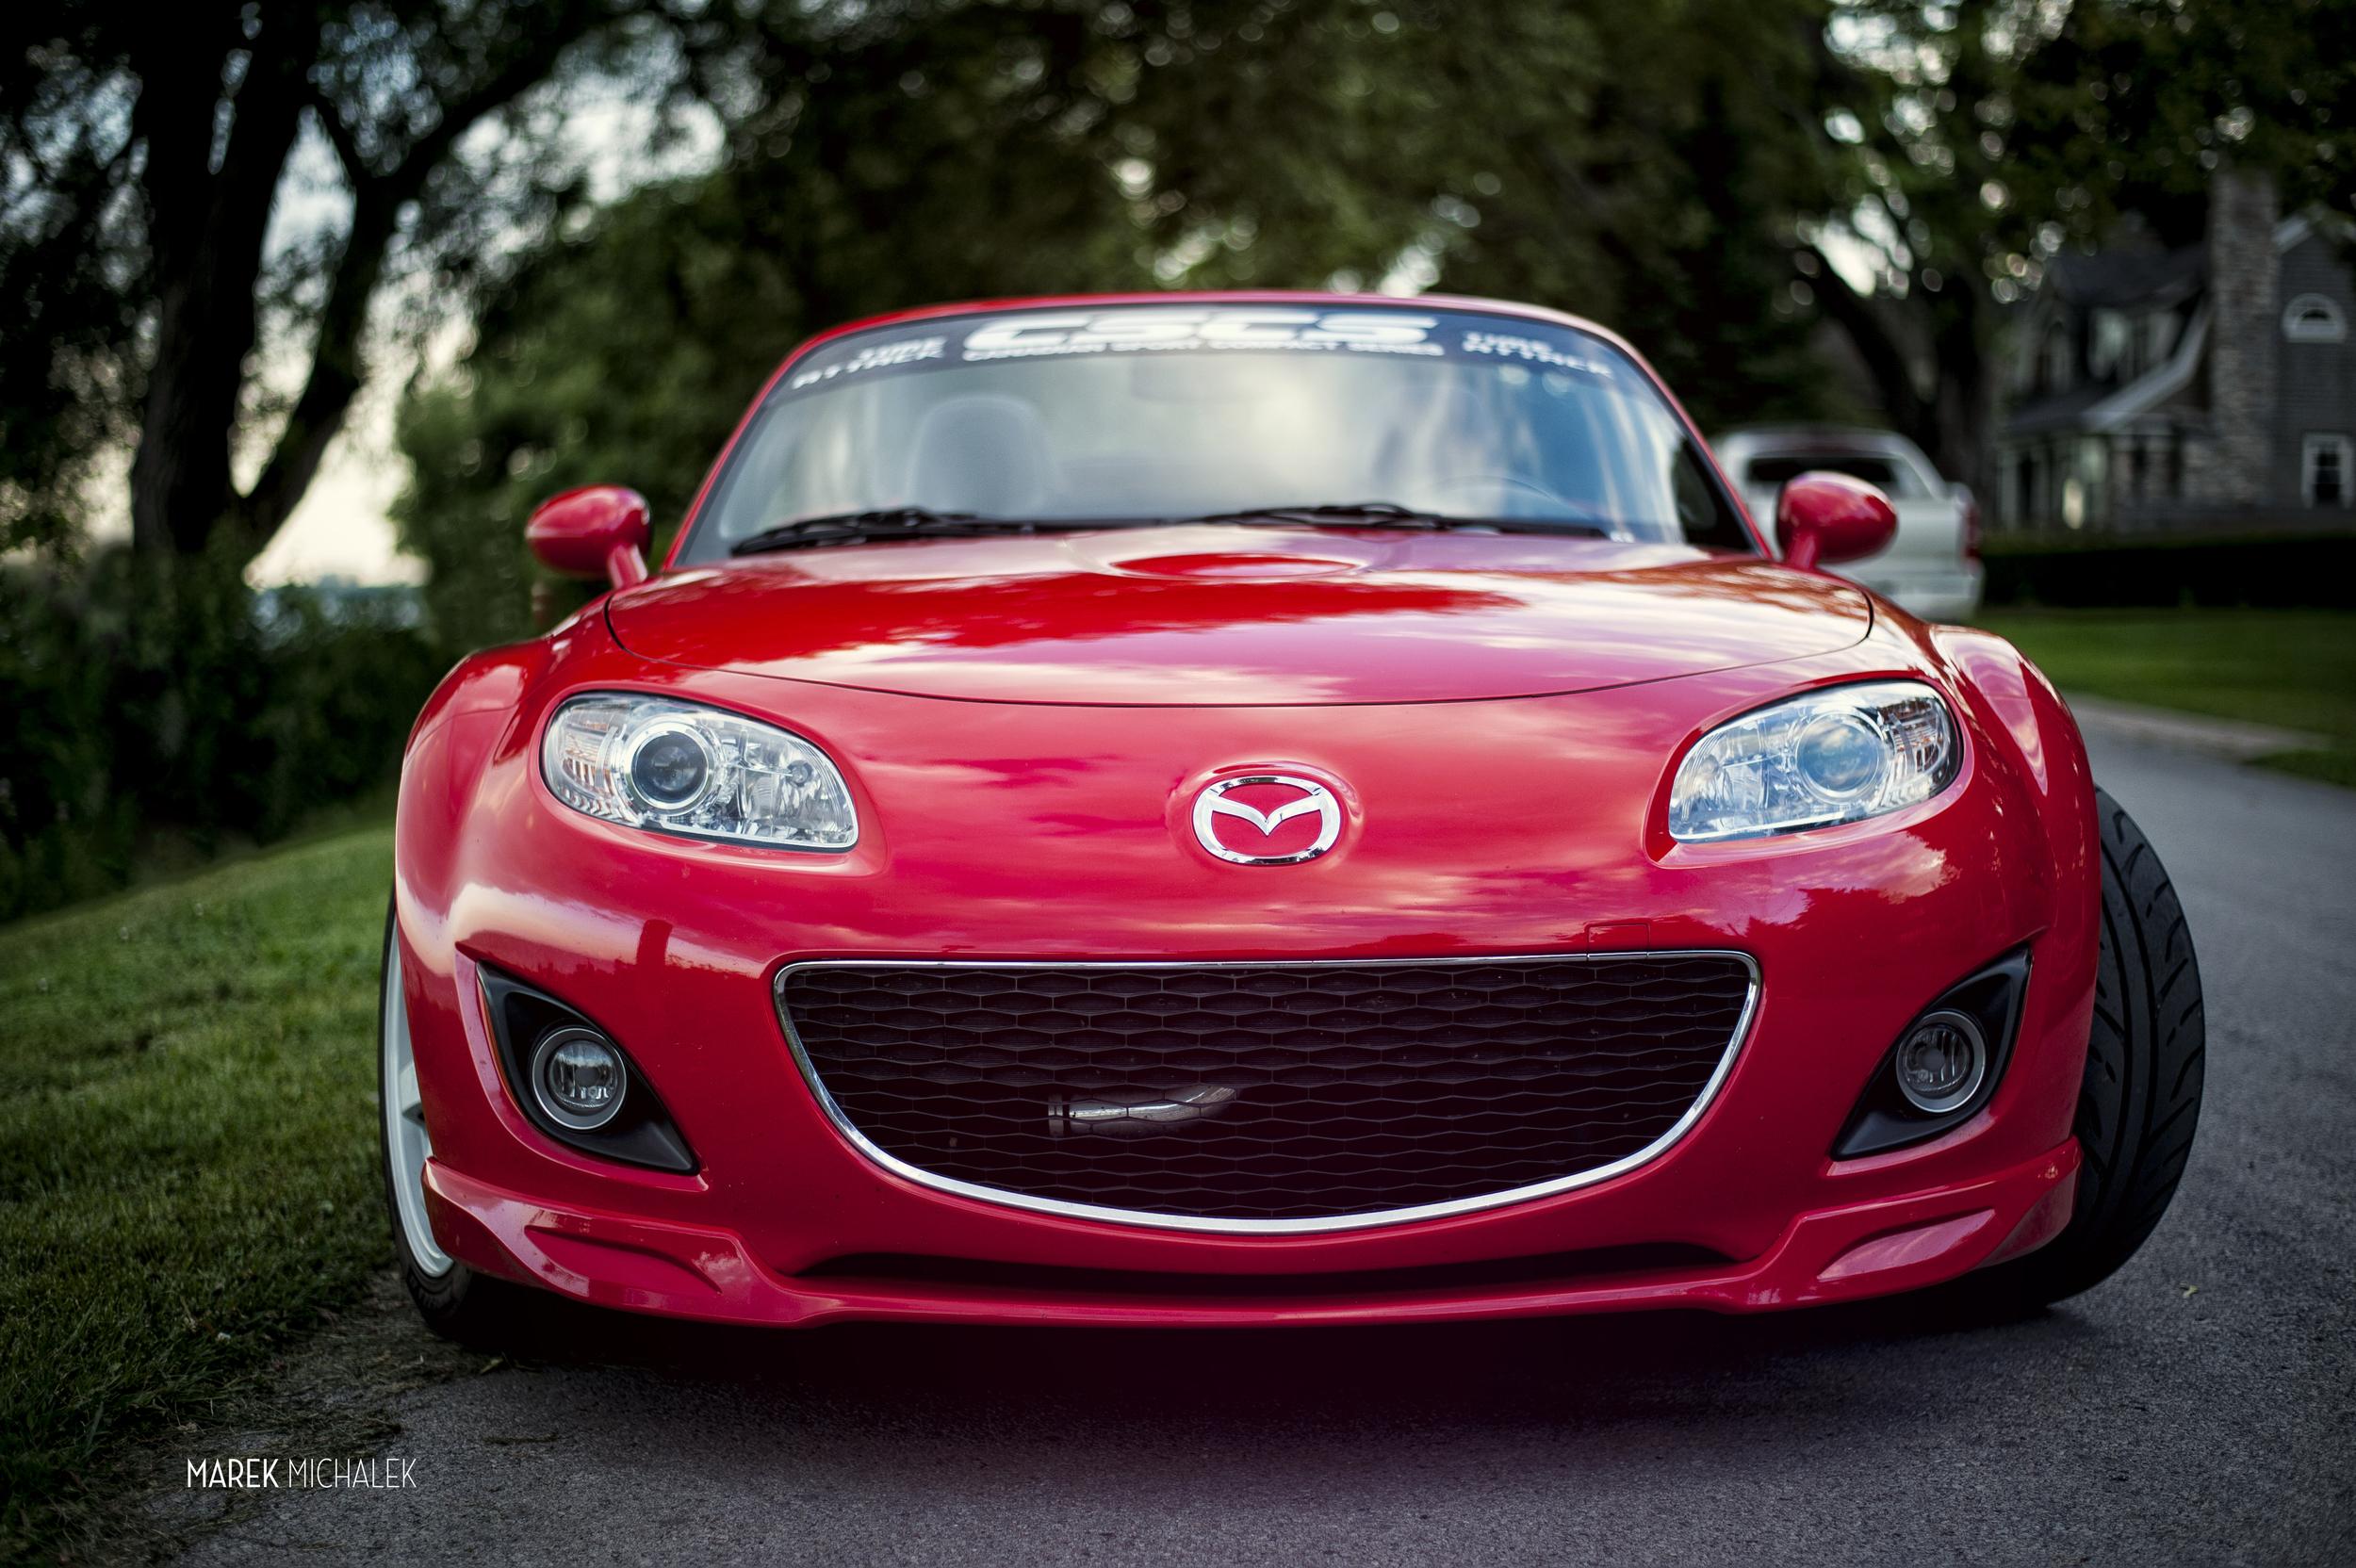 Toronto Hamilton Automotive Photographer - Marek Michalek - Mazda Miata 04.jpg